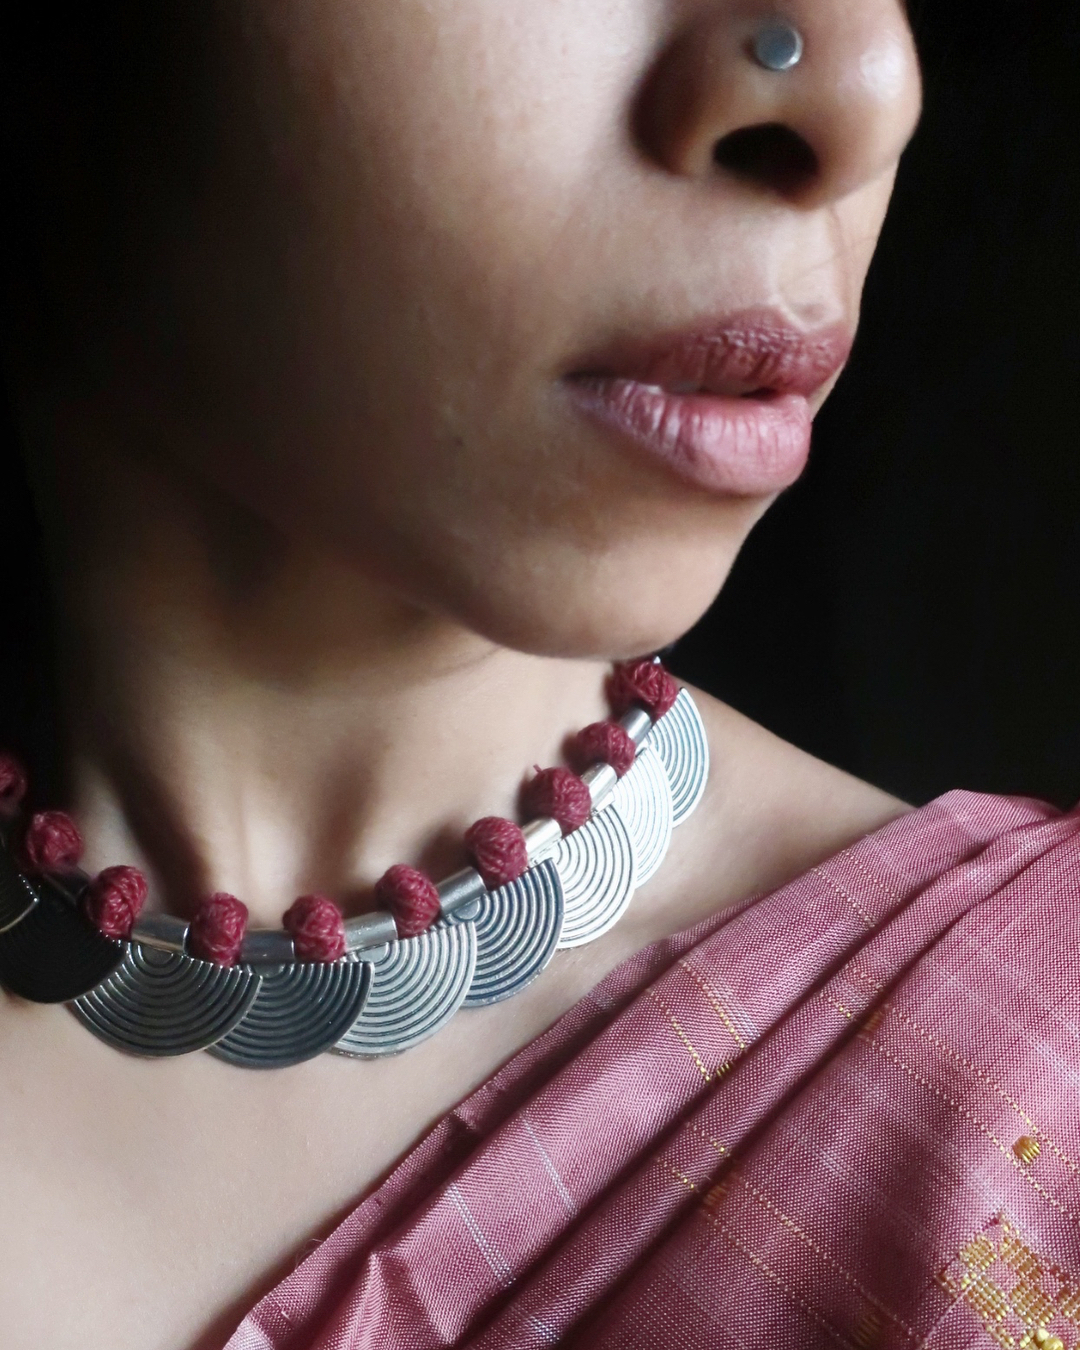 handmade-fashion-jewellery (9)handmade-fashion-jewellery (9)